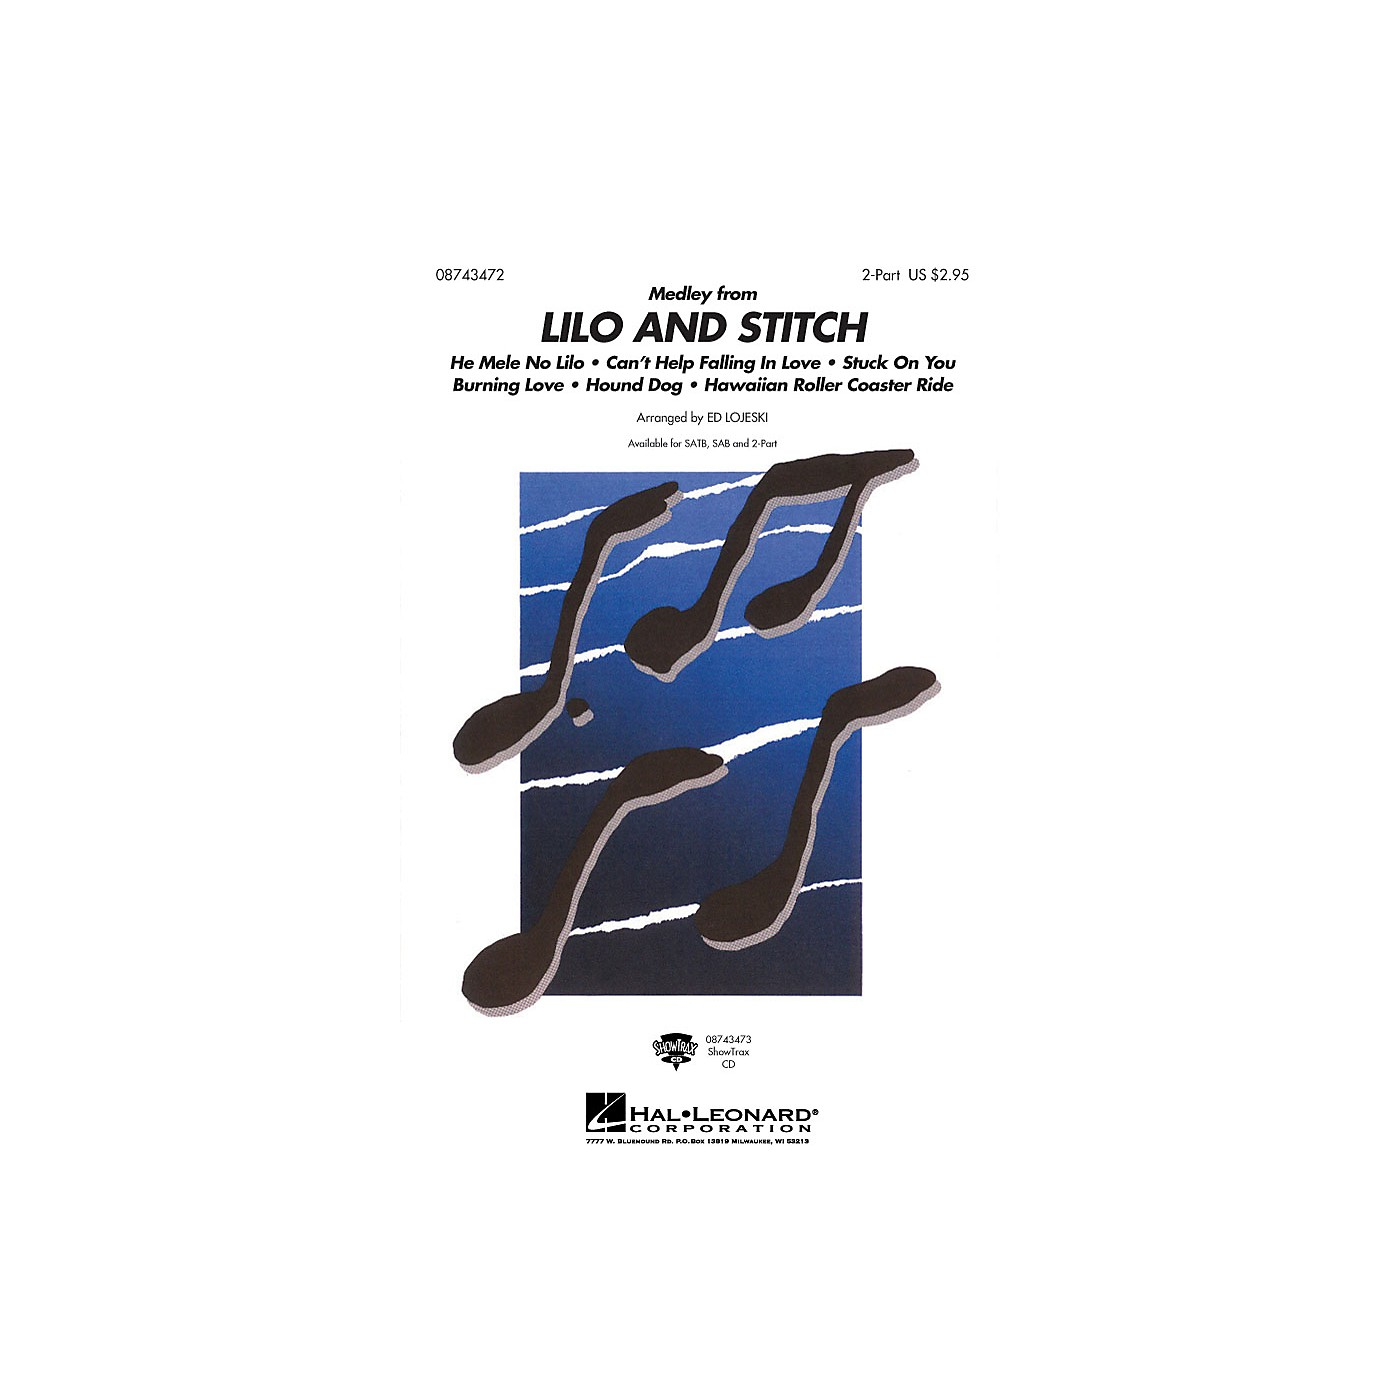 Hal Leonard Lilo and Stitch (Medley) 2-Part arranged by Ed Lojeski thumbnail